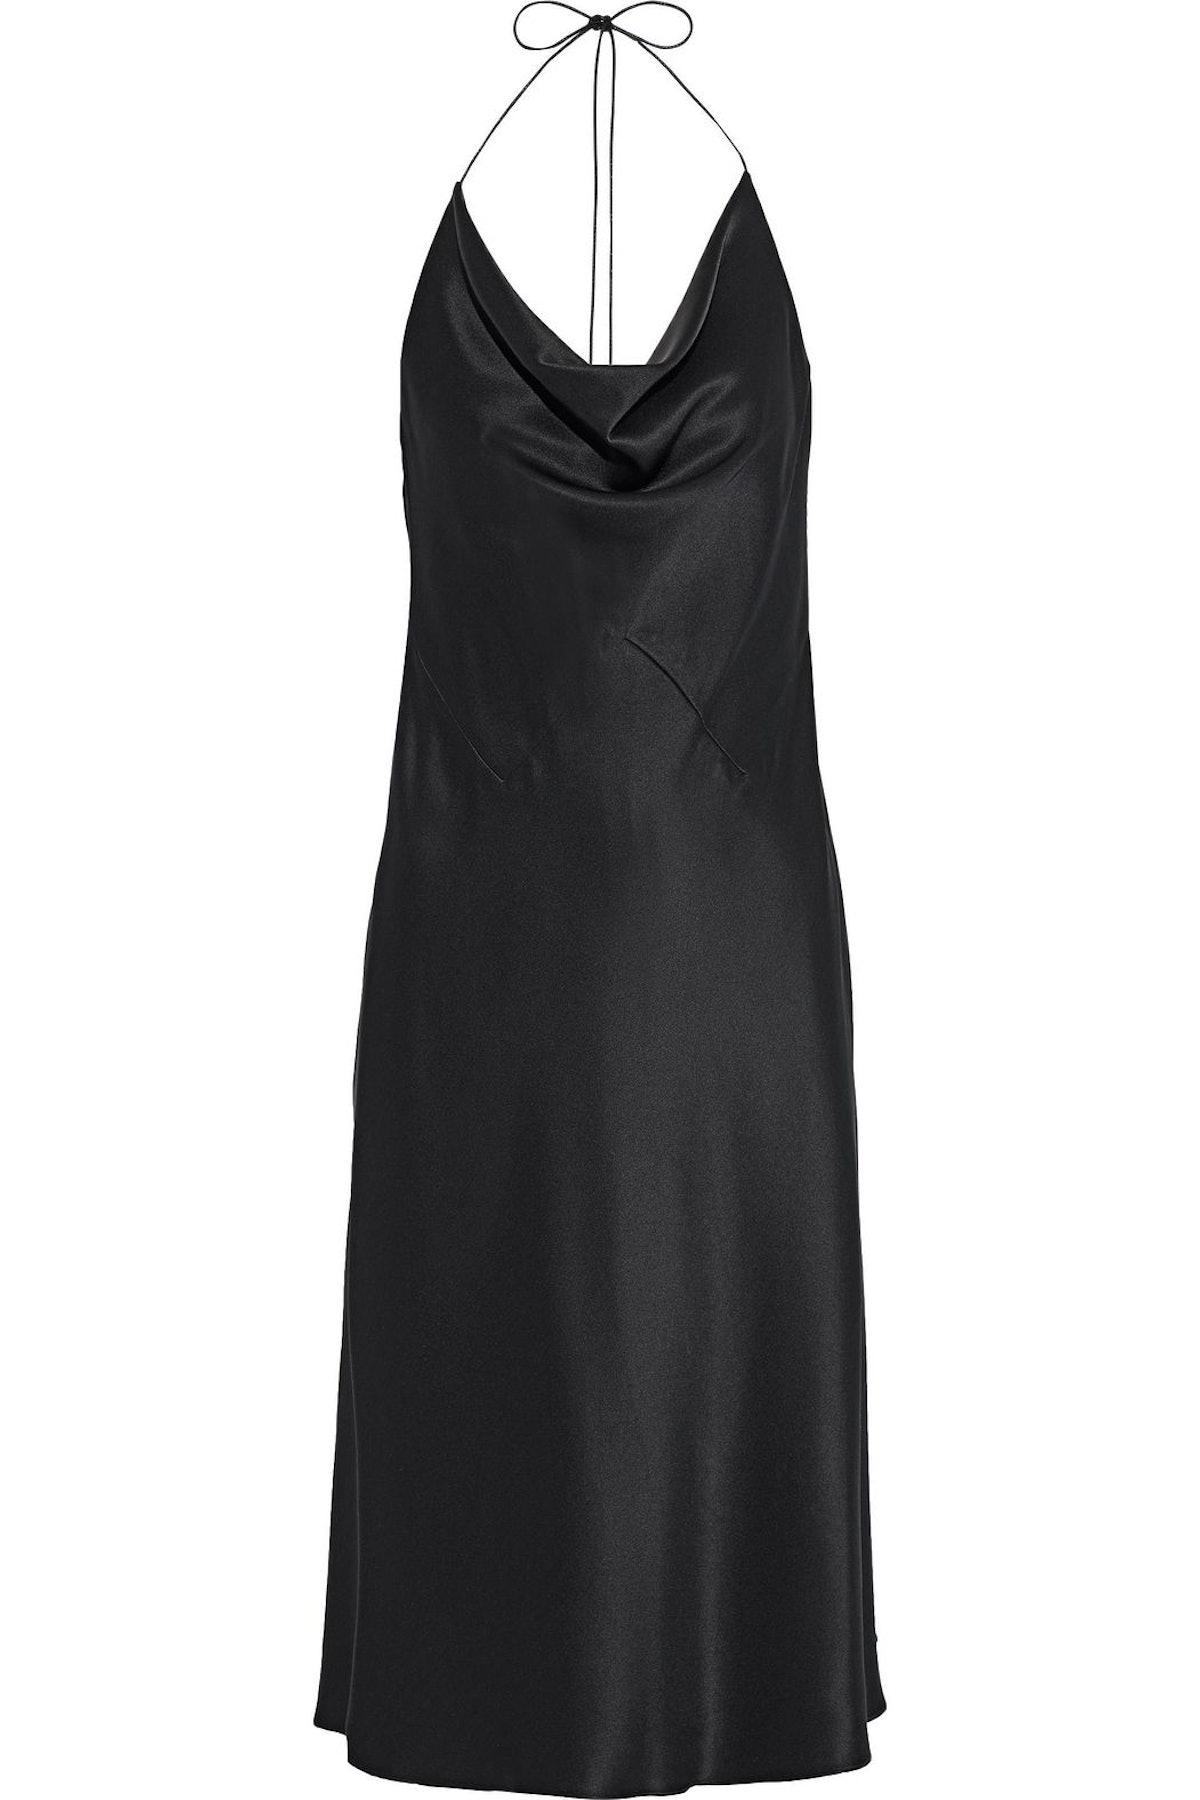 Cushnie Draped Silk-Satin Halterneck Slip Dress The Outnet Sale